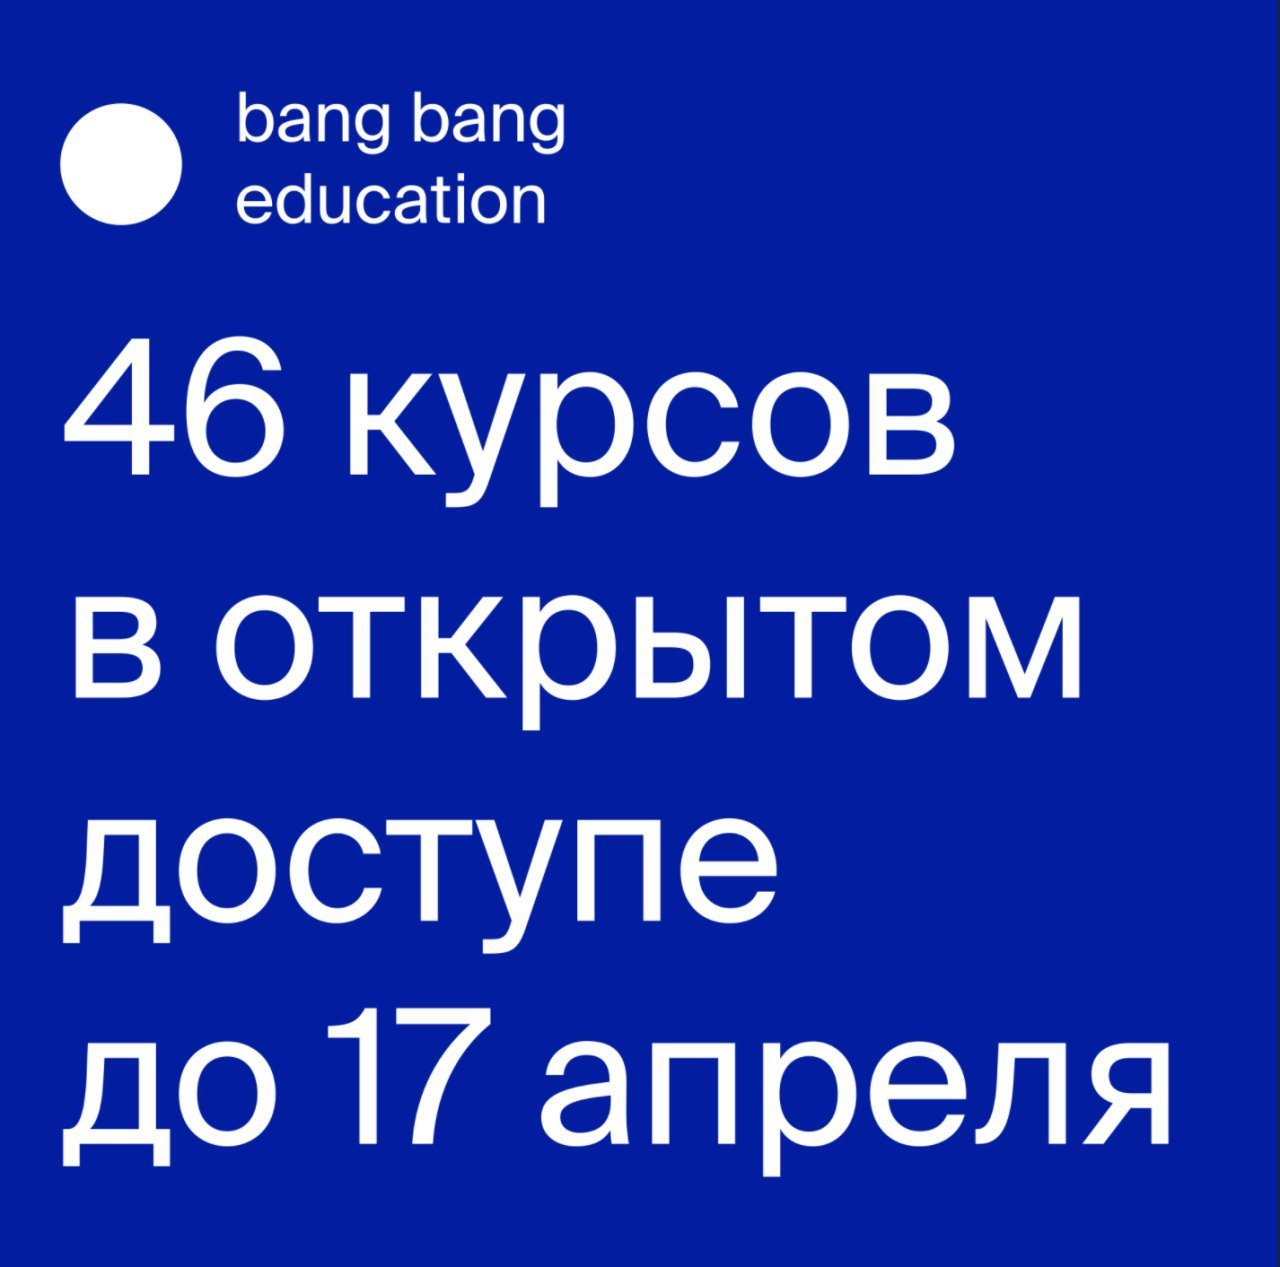 Bang-Bang-Education.-Kartinka-vzyata-s-ofitsialnoj-stranichki-Facebook